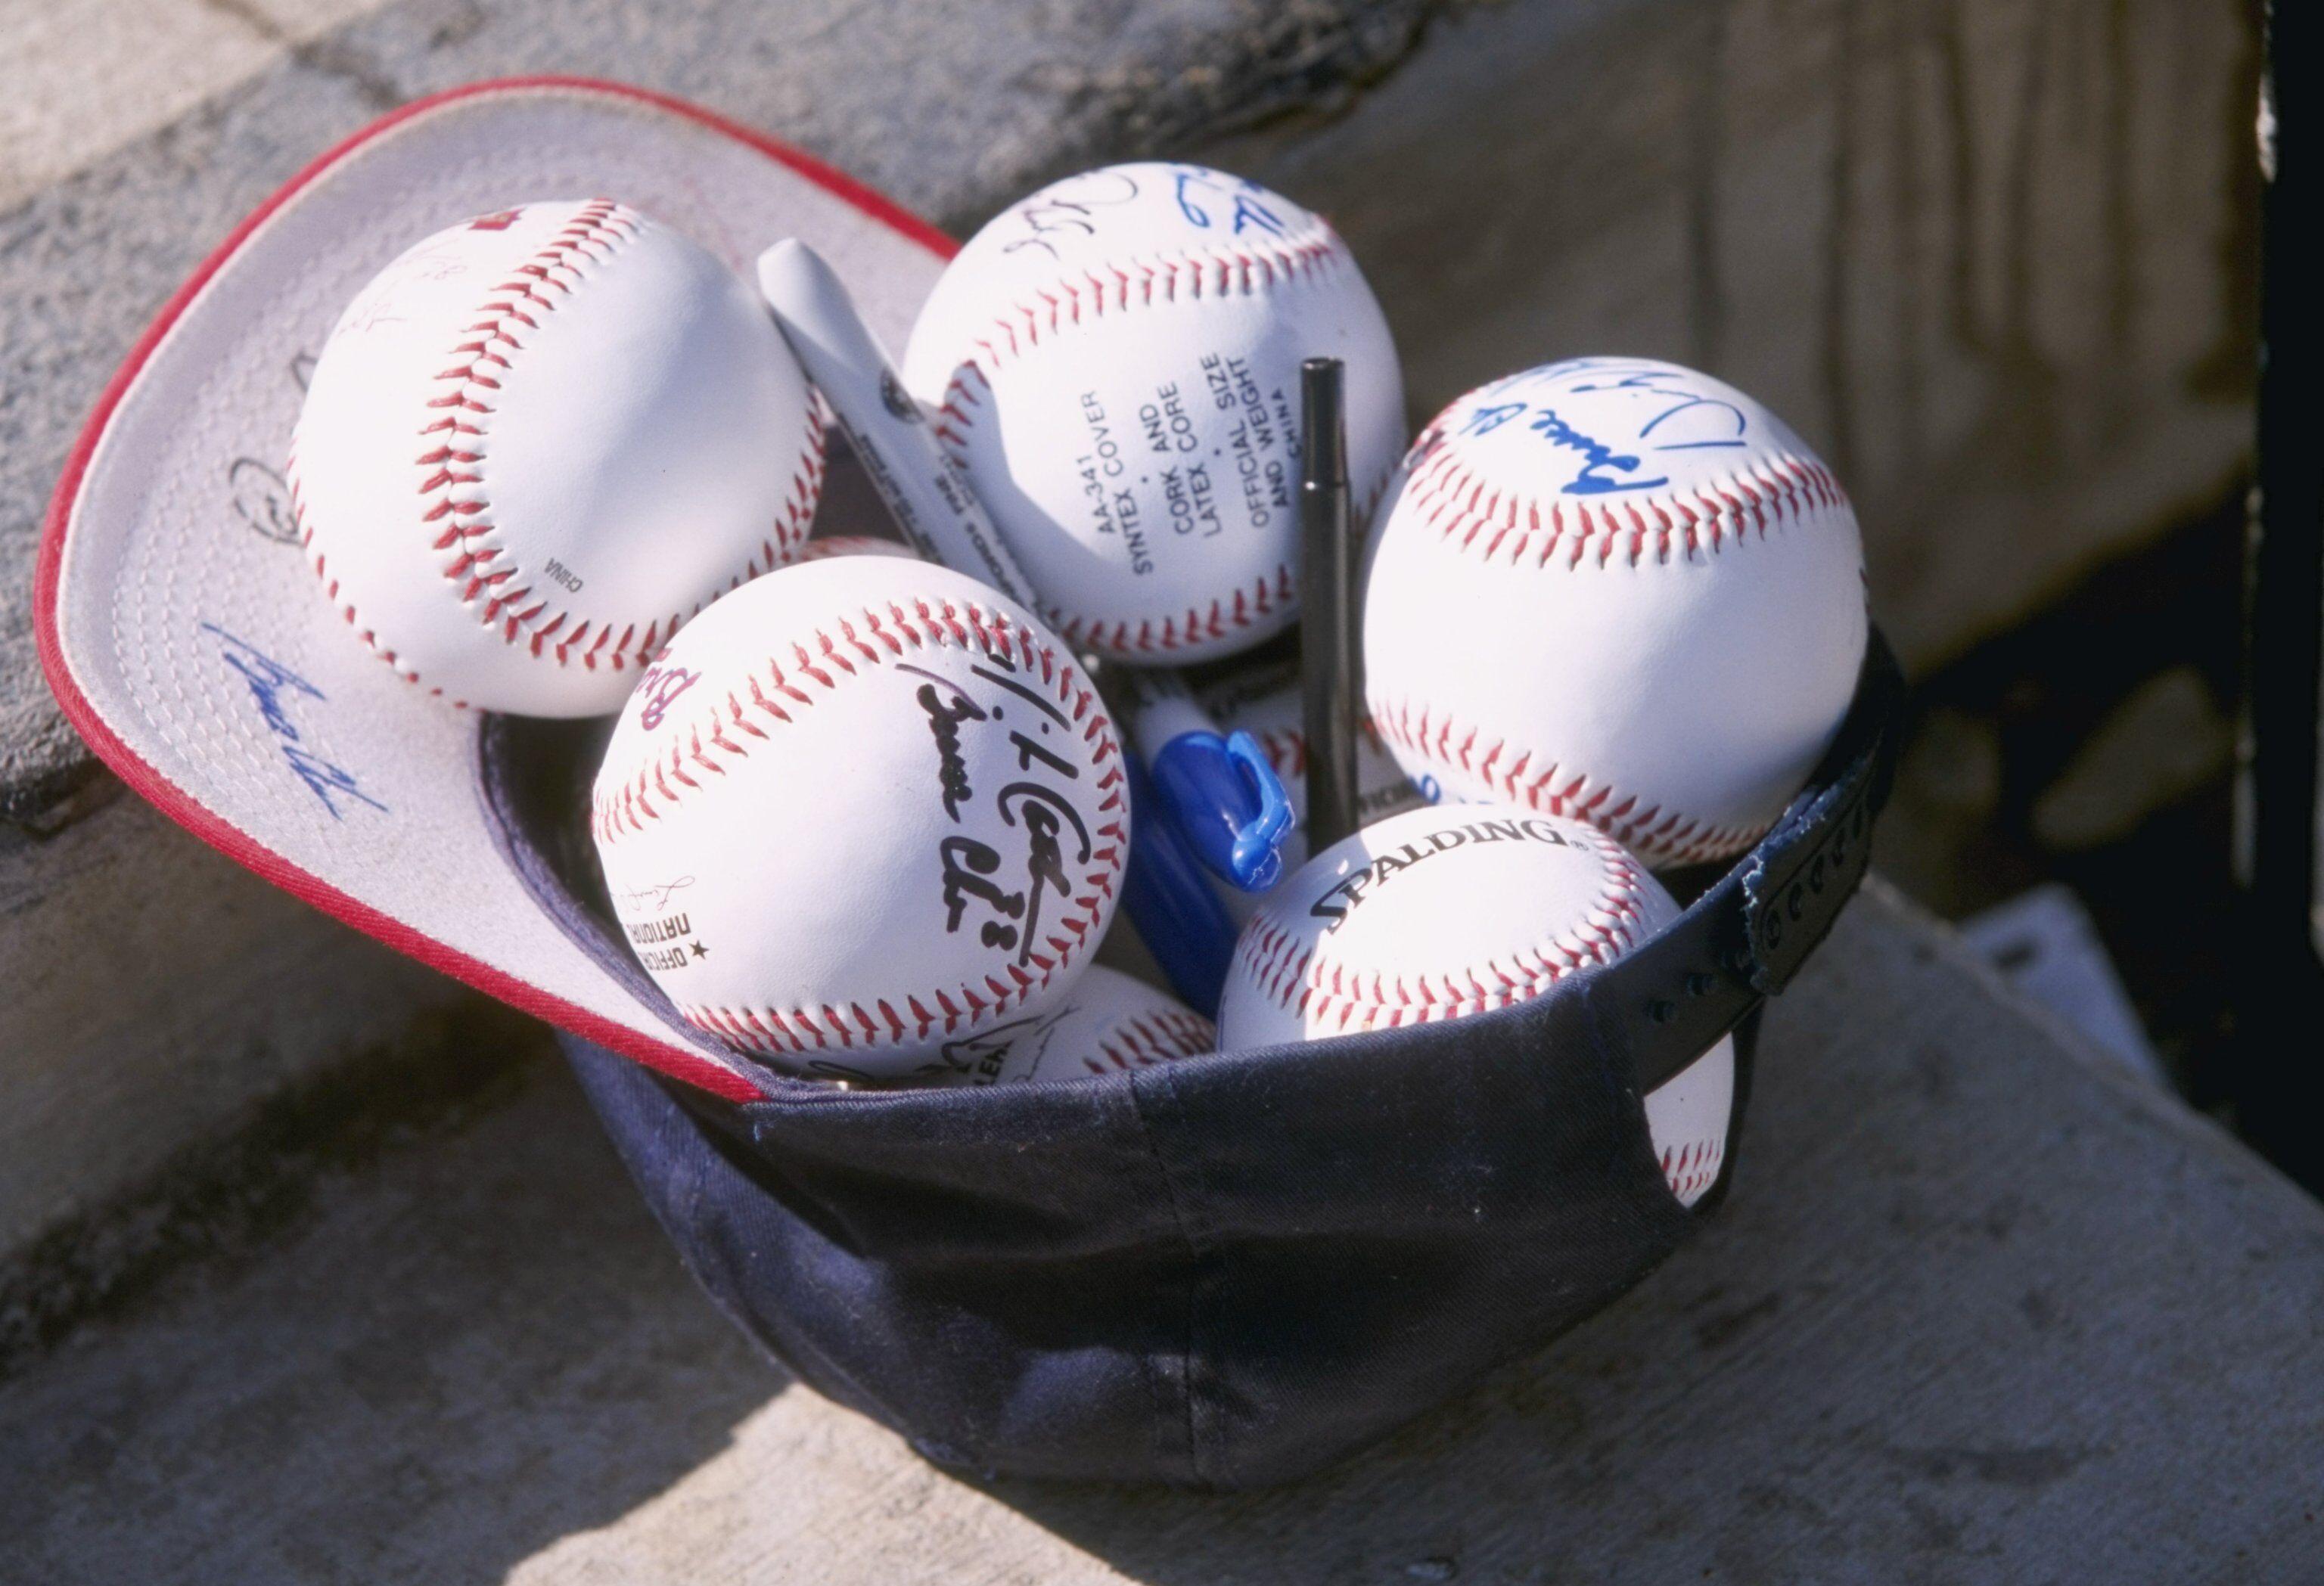 273990-autographed-balls.jpg